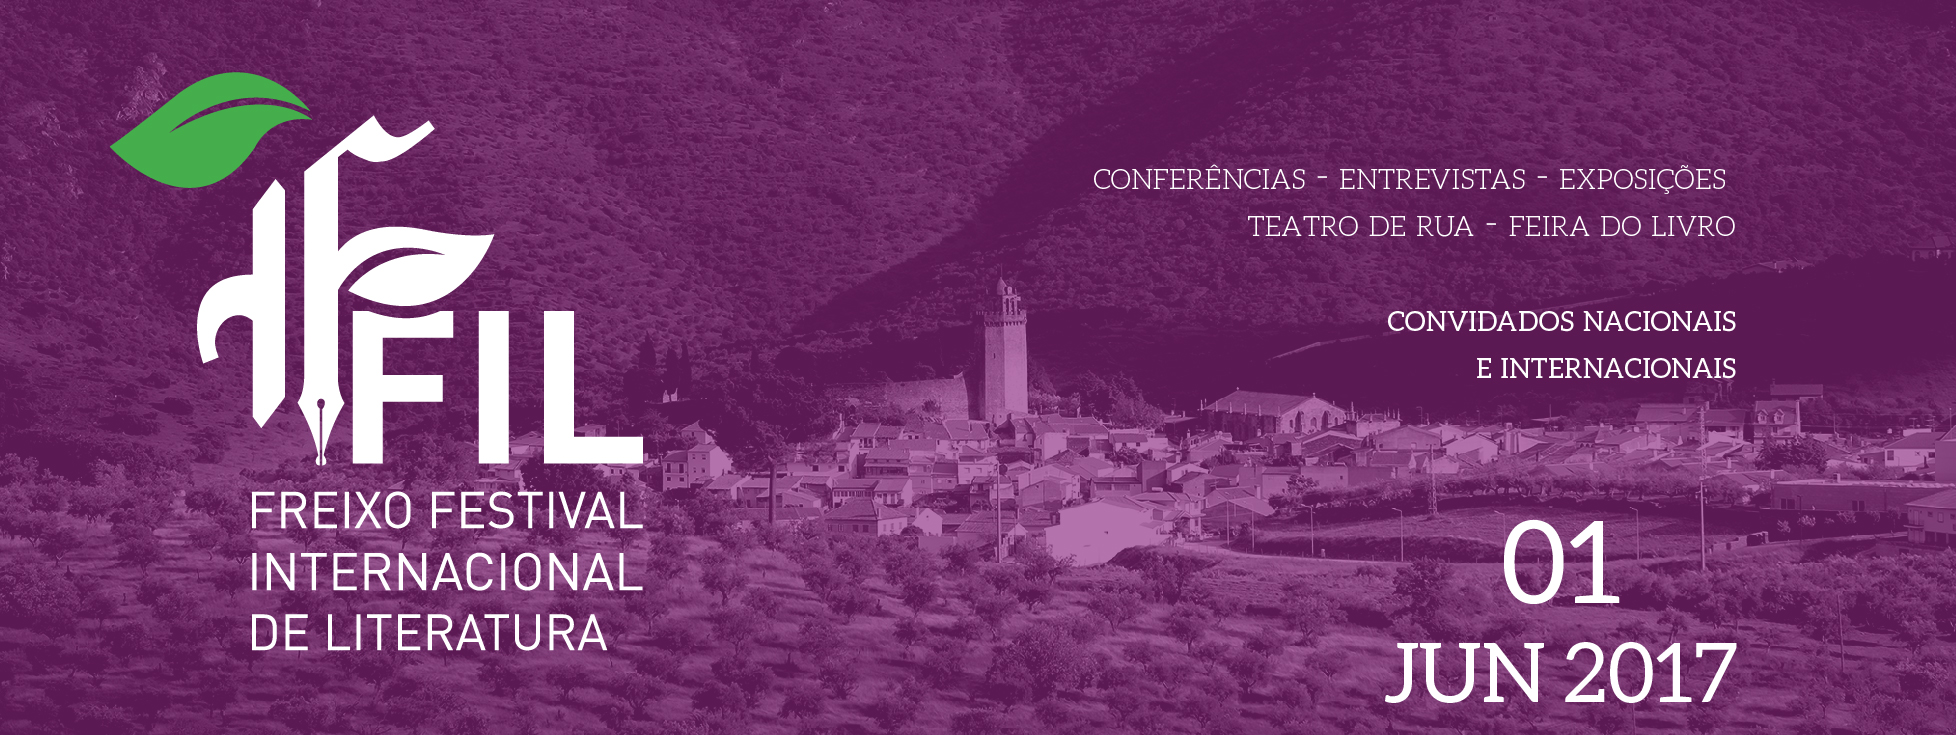 FFIL_ Freixo Festival Internacional de Literatura – Dia 1 de junho